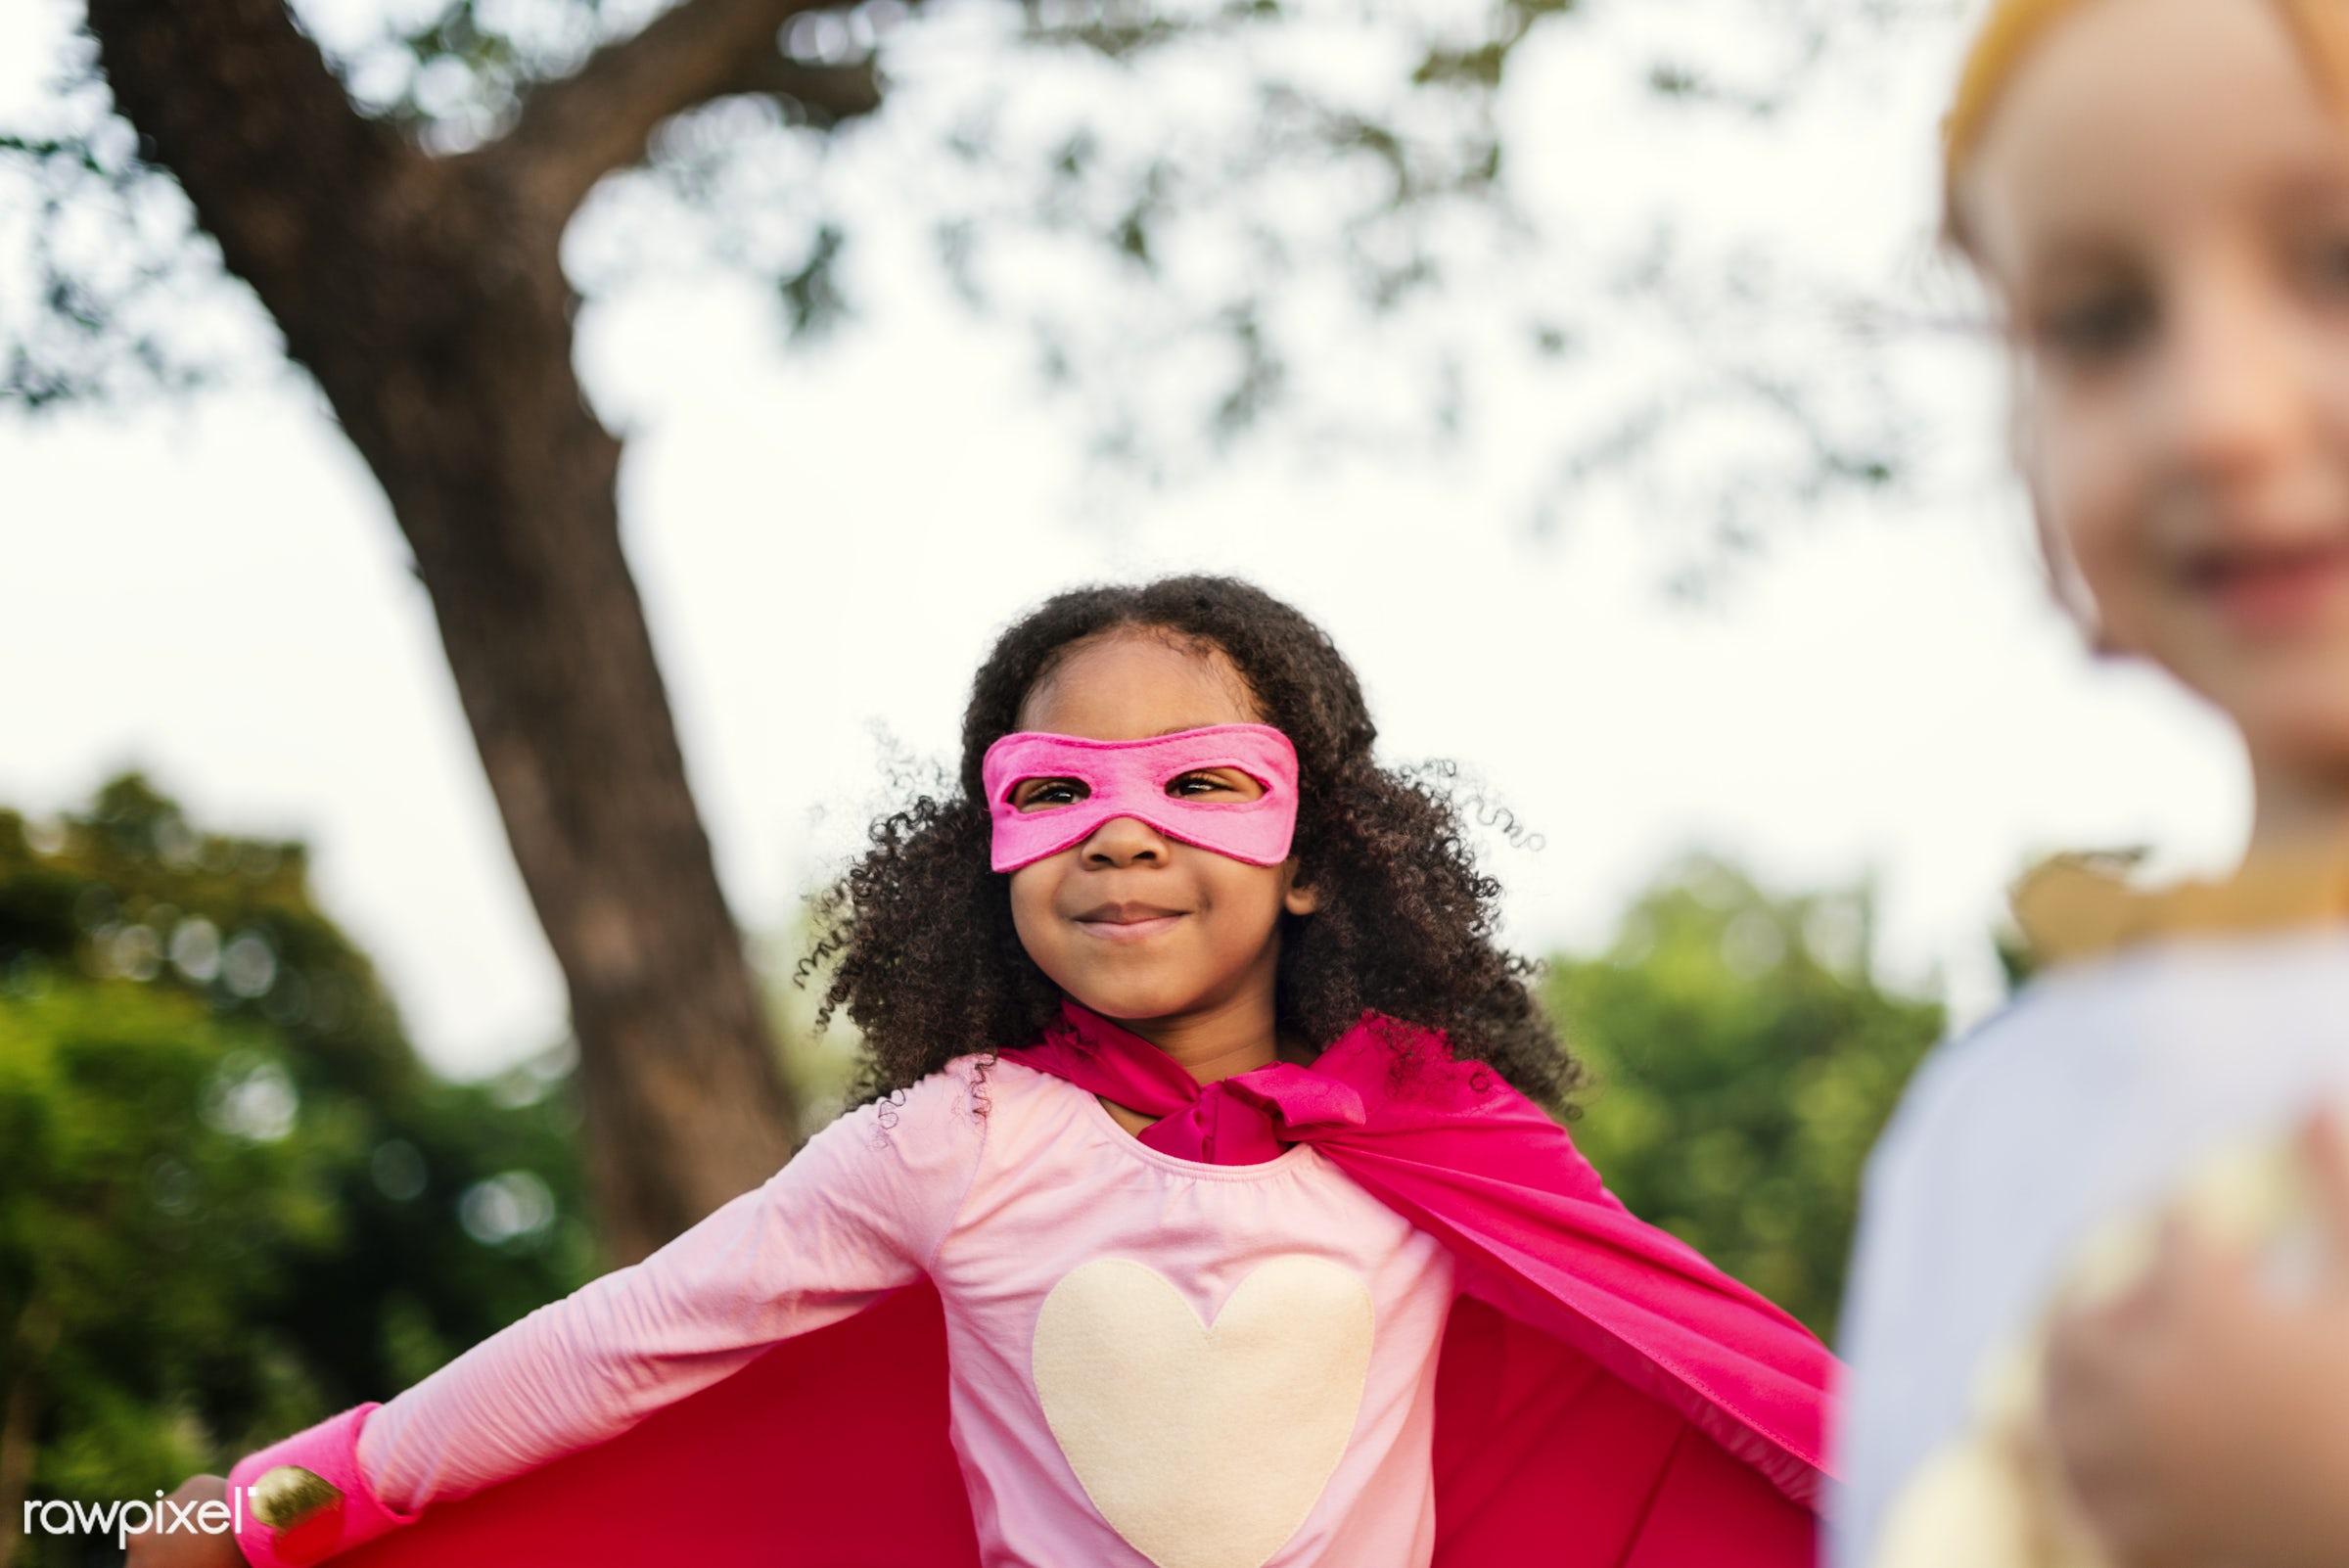 Superhero kids with superpowers - superhero, activity, african descent, aspirations, brave, cheerful, child, childhood,...